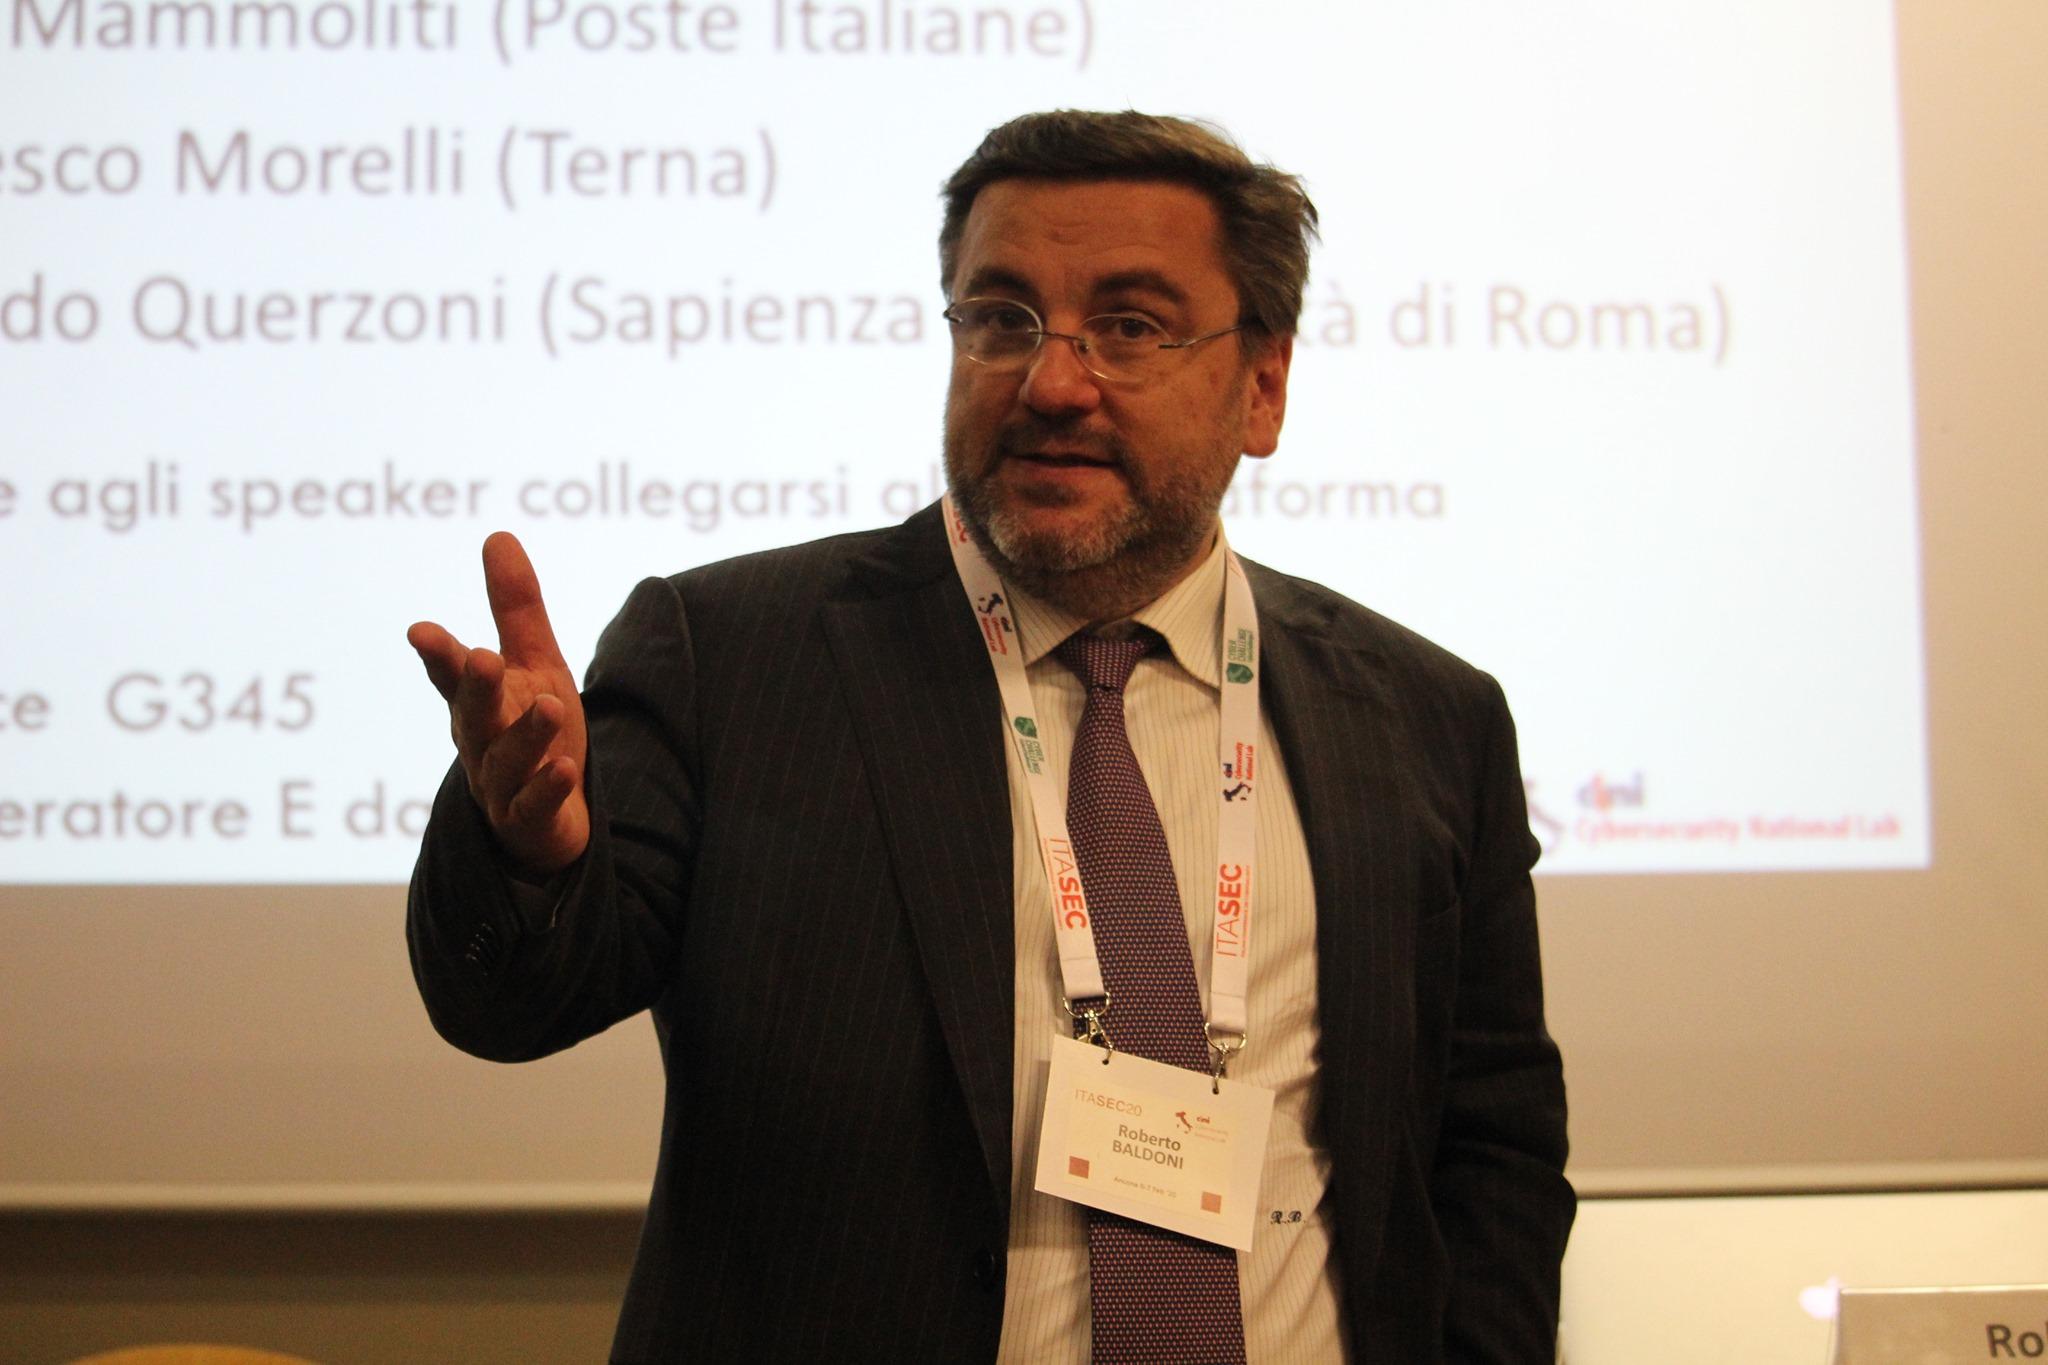 Roberto Baldoni